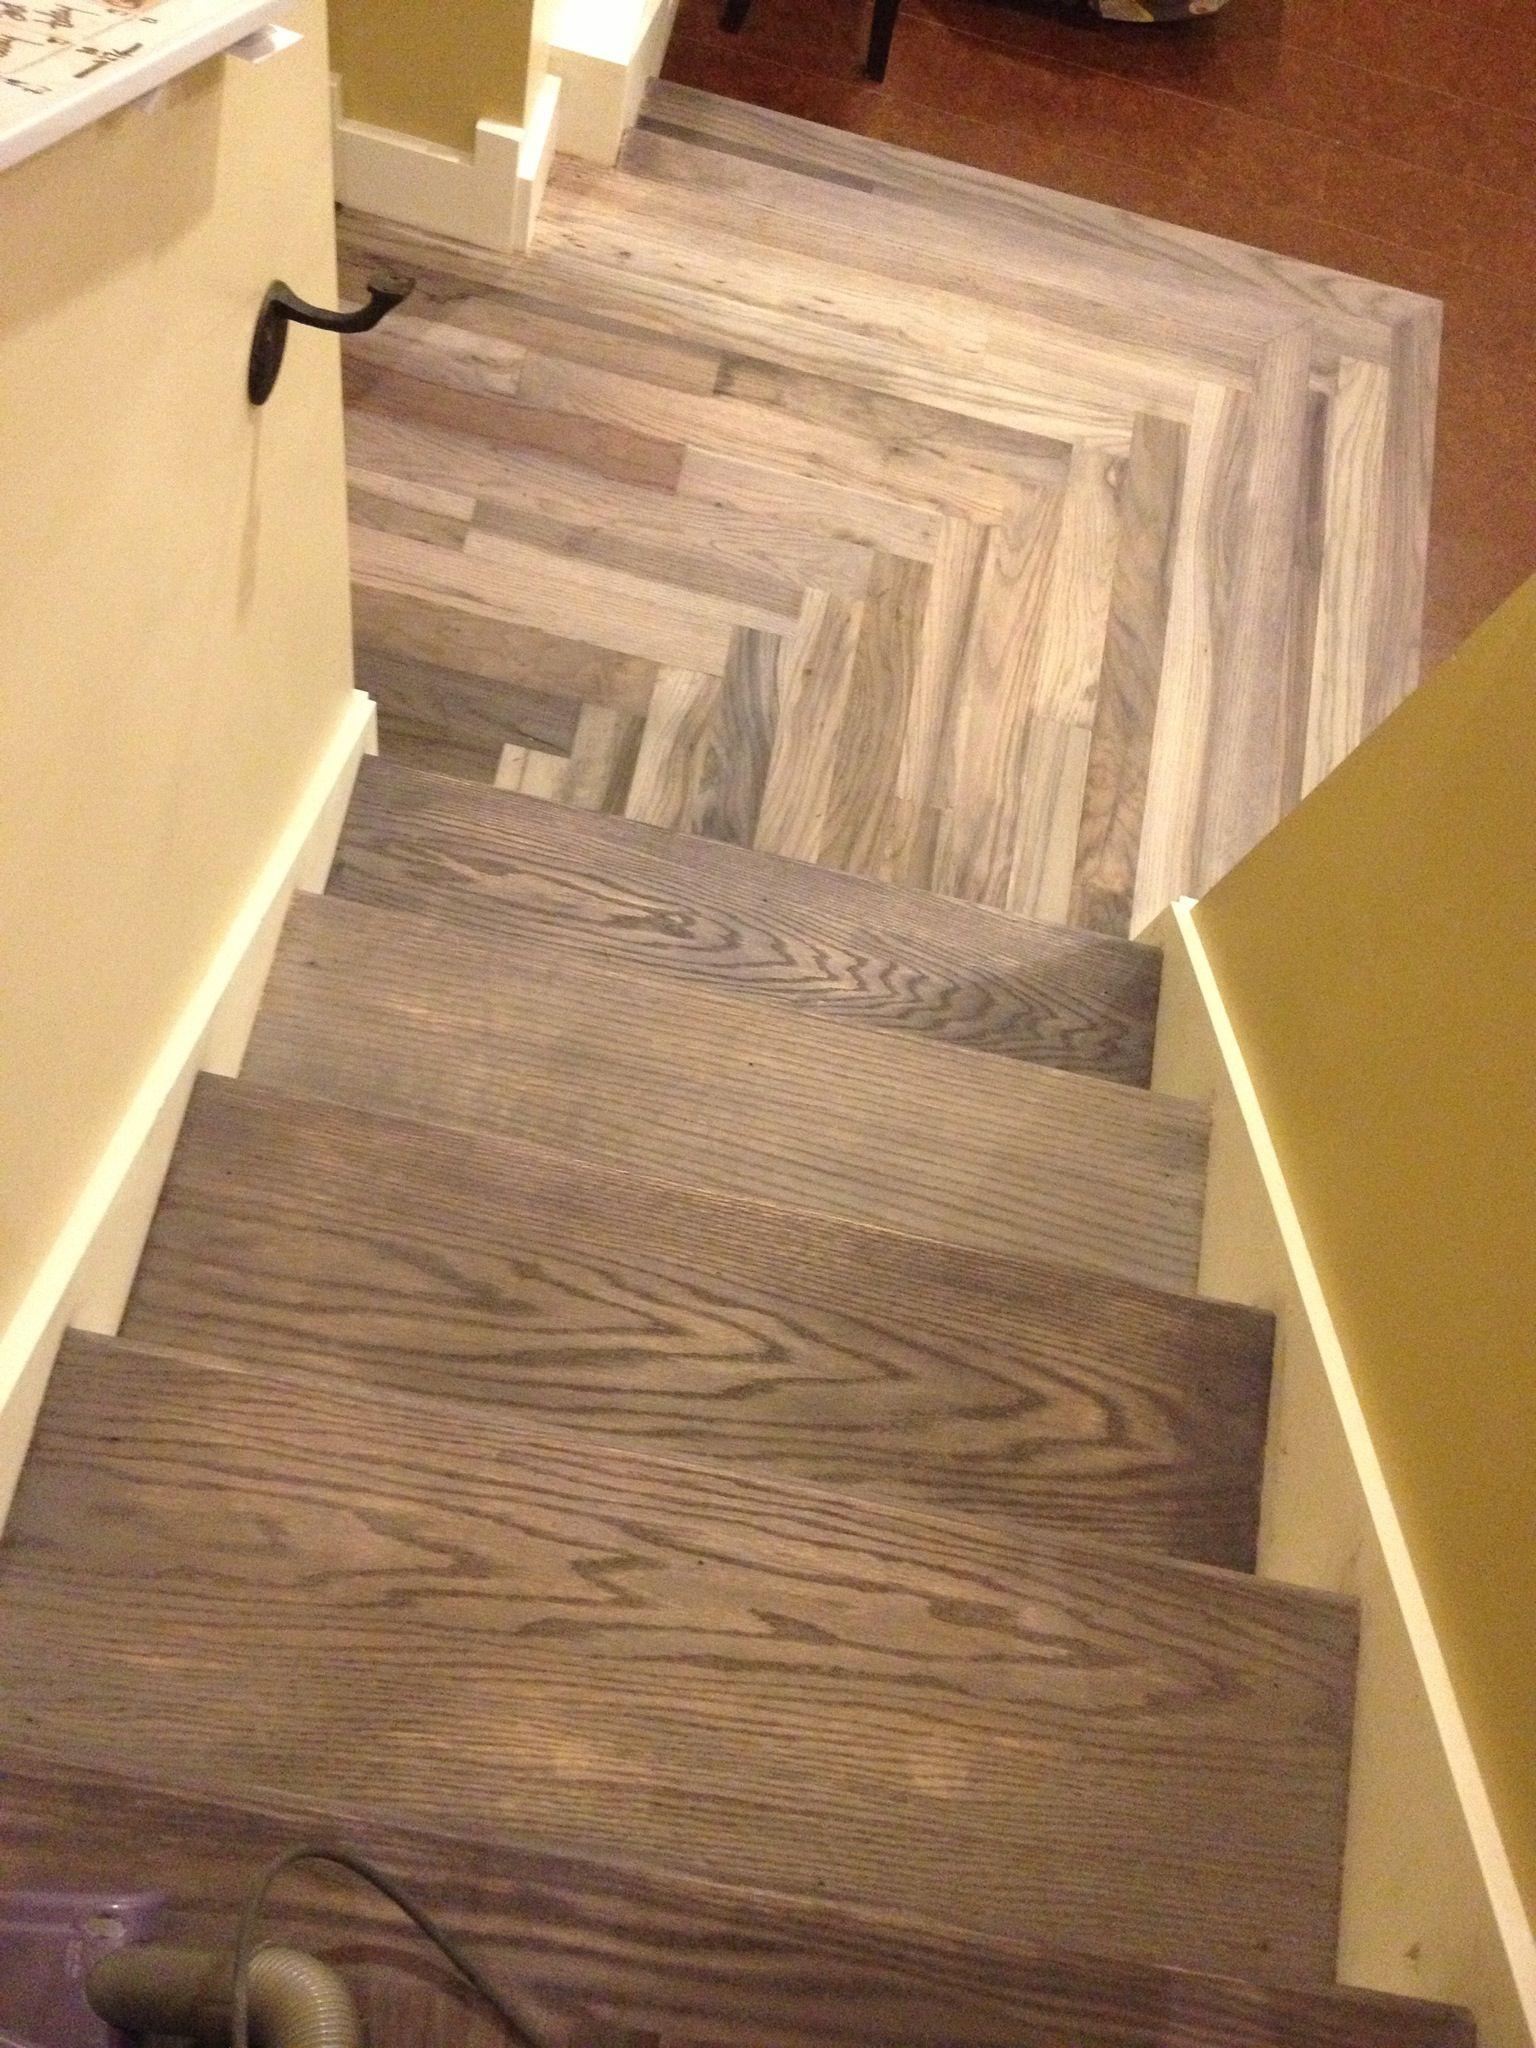 Stained oak stairs with apple cider vinegar and steel wool for Hardwood floors vinegar